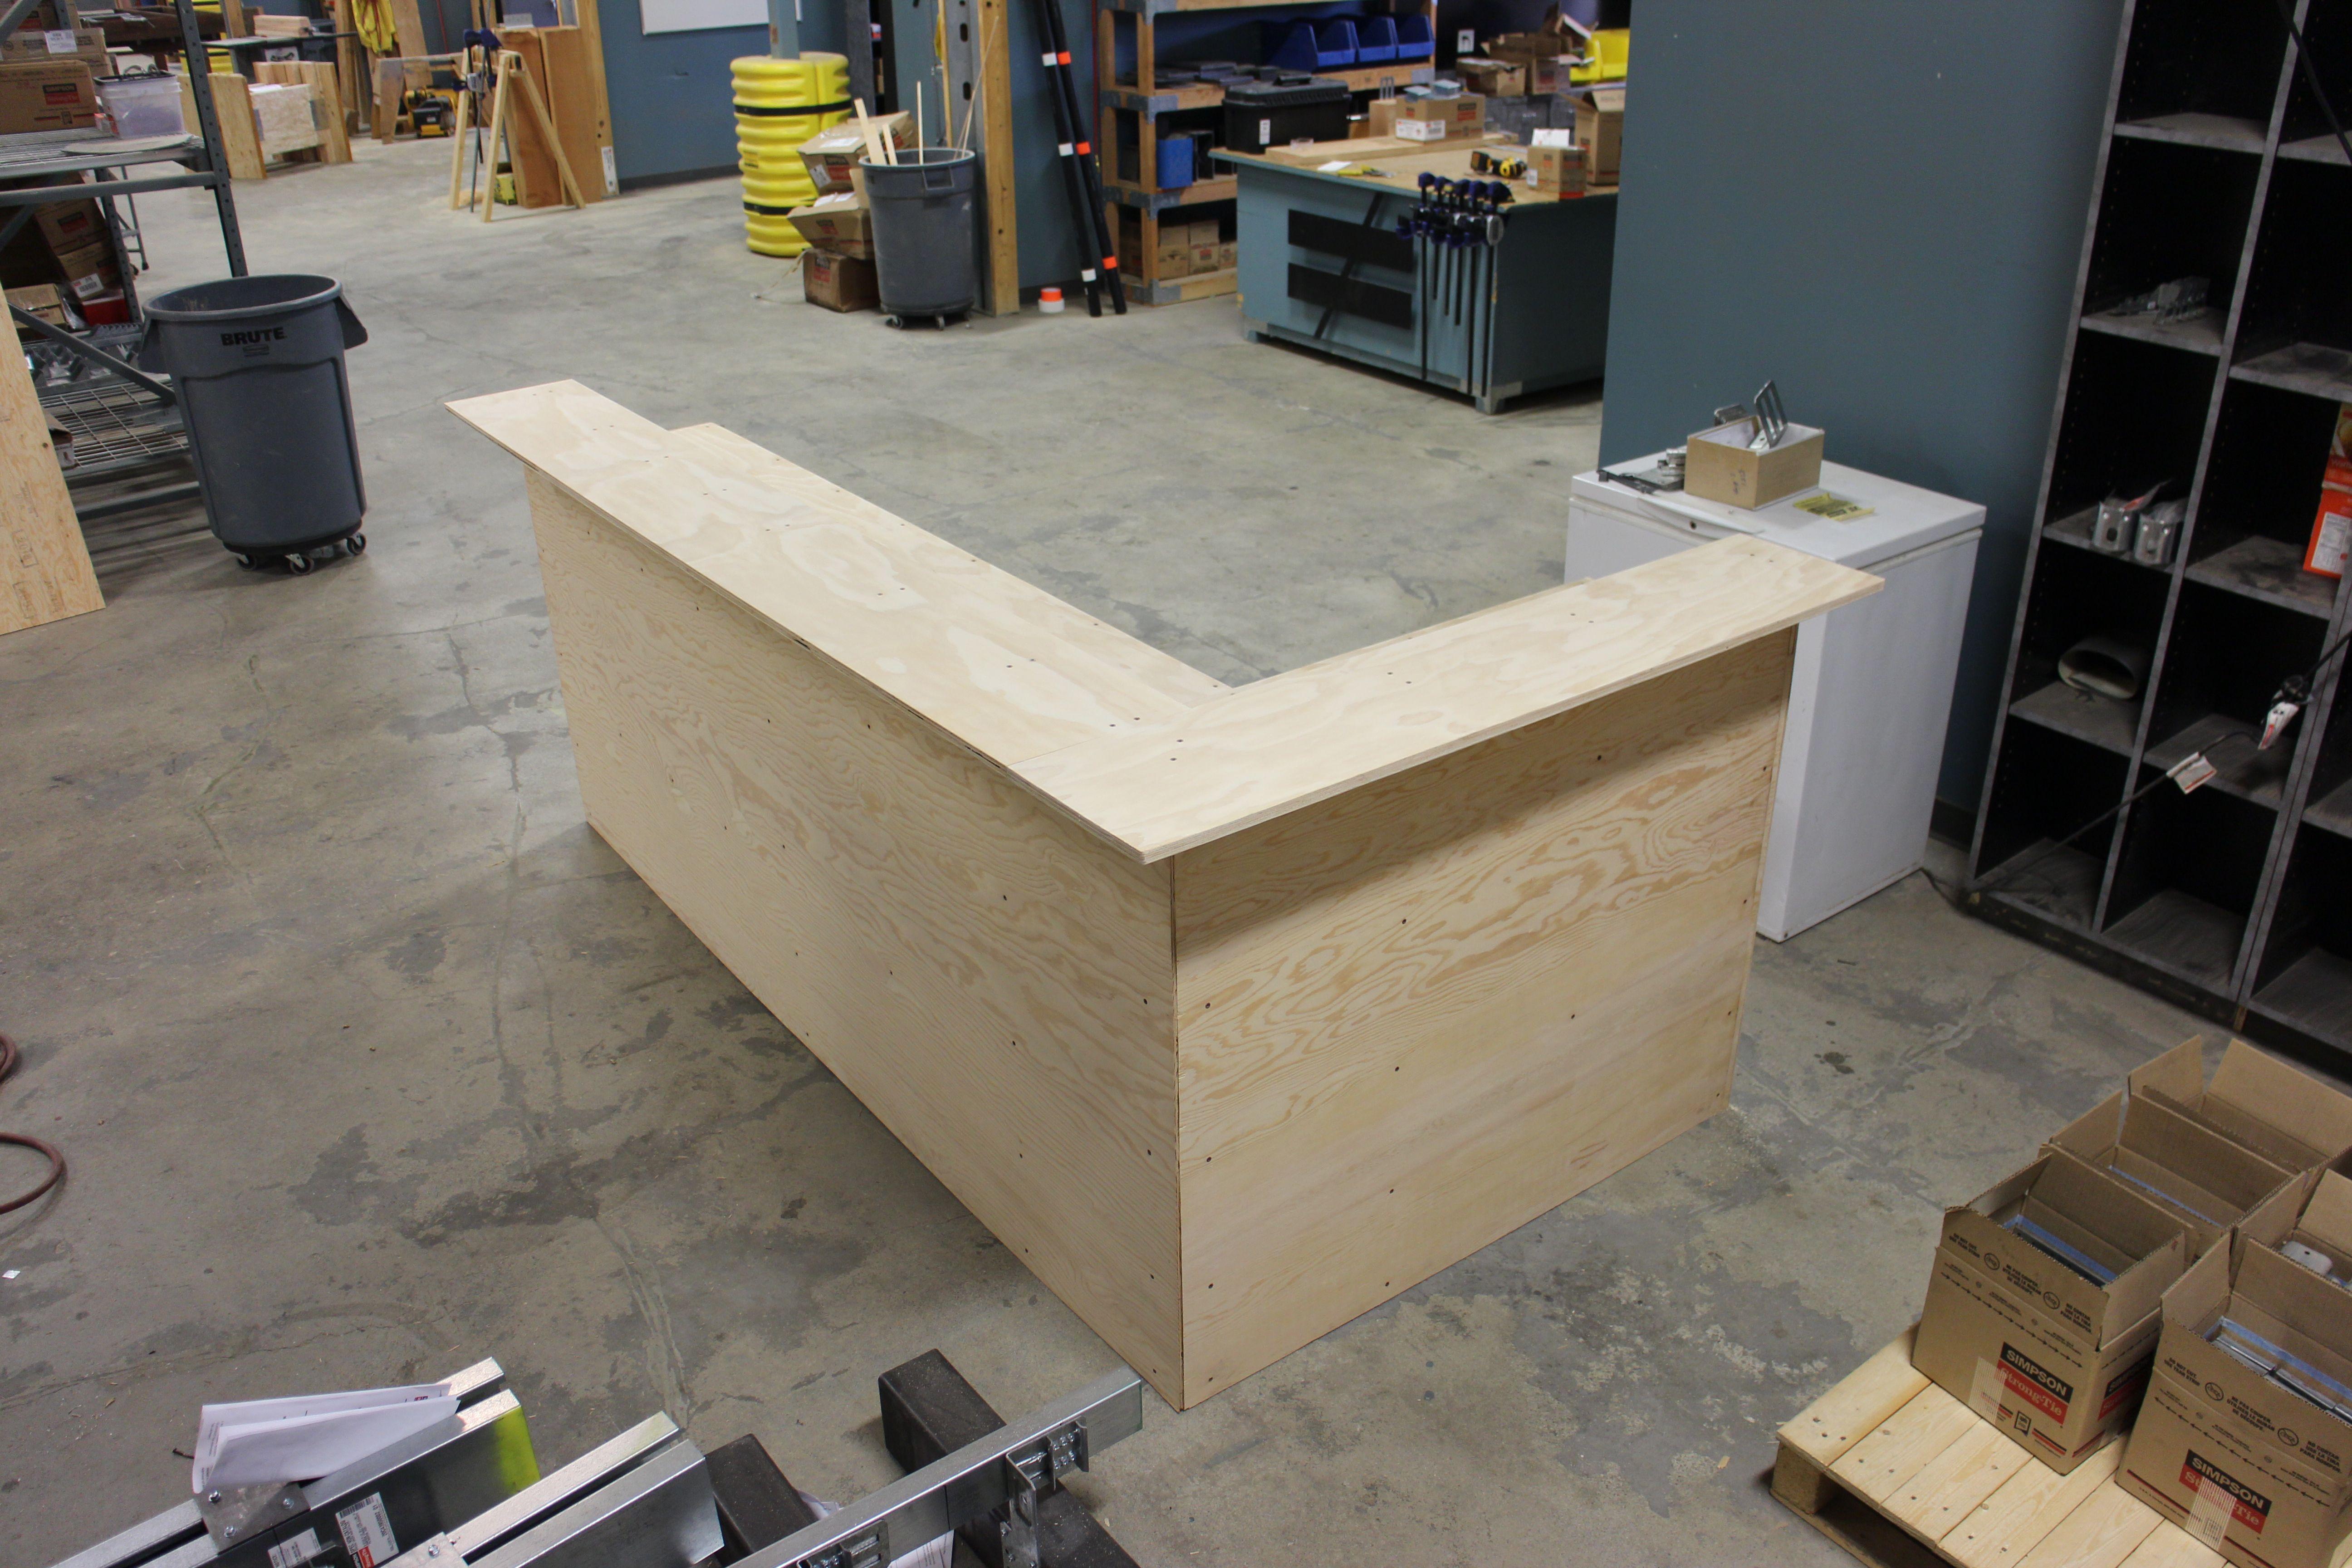 Our interns built a DIY bar Learn how you can build our own DIY bar